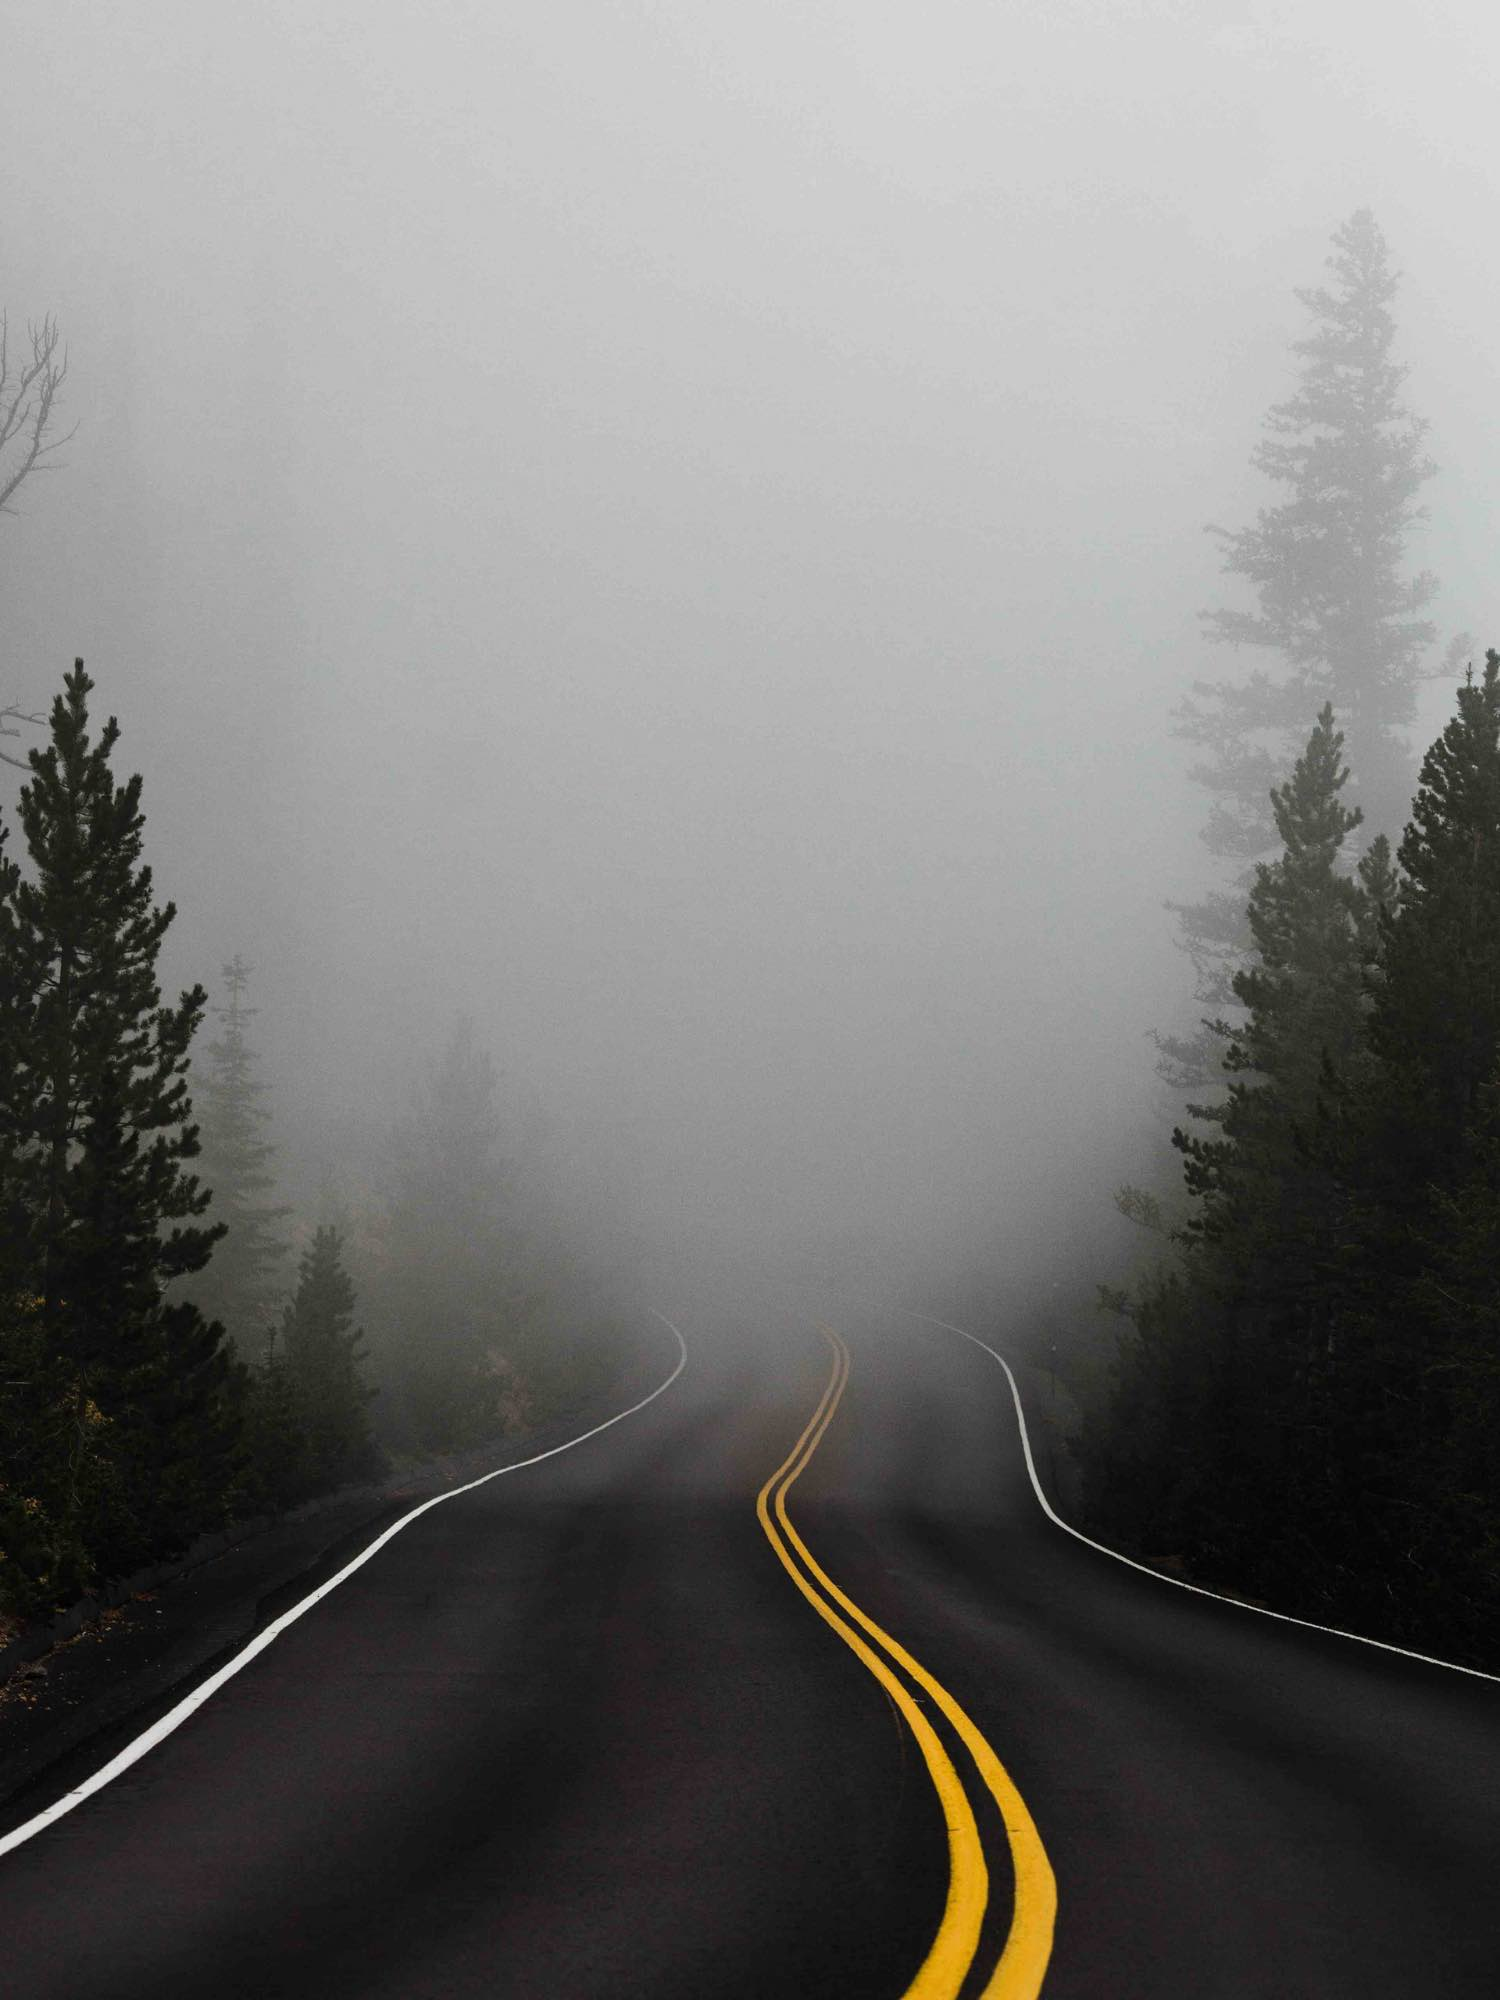 Naviguer dans l'inconnu et l'incertitude